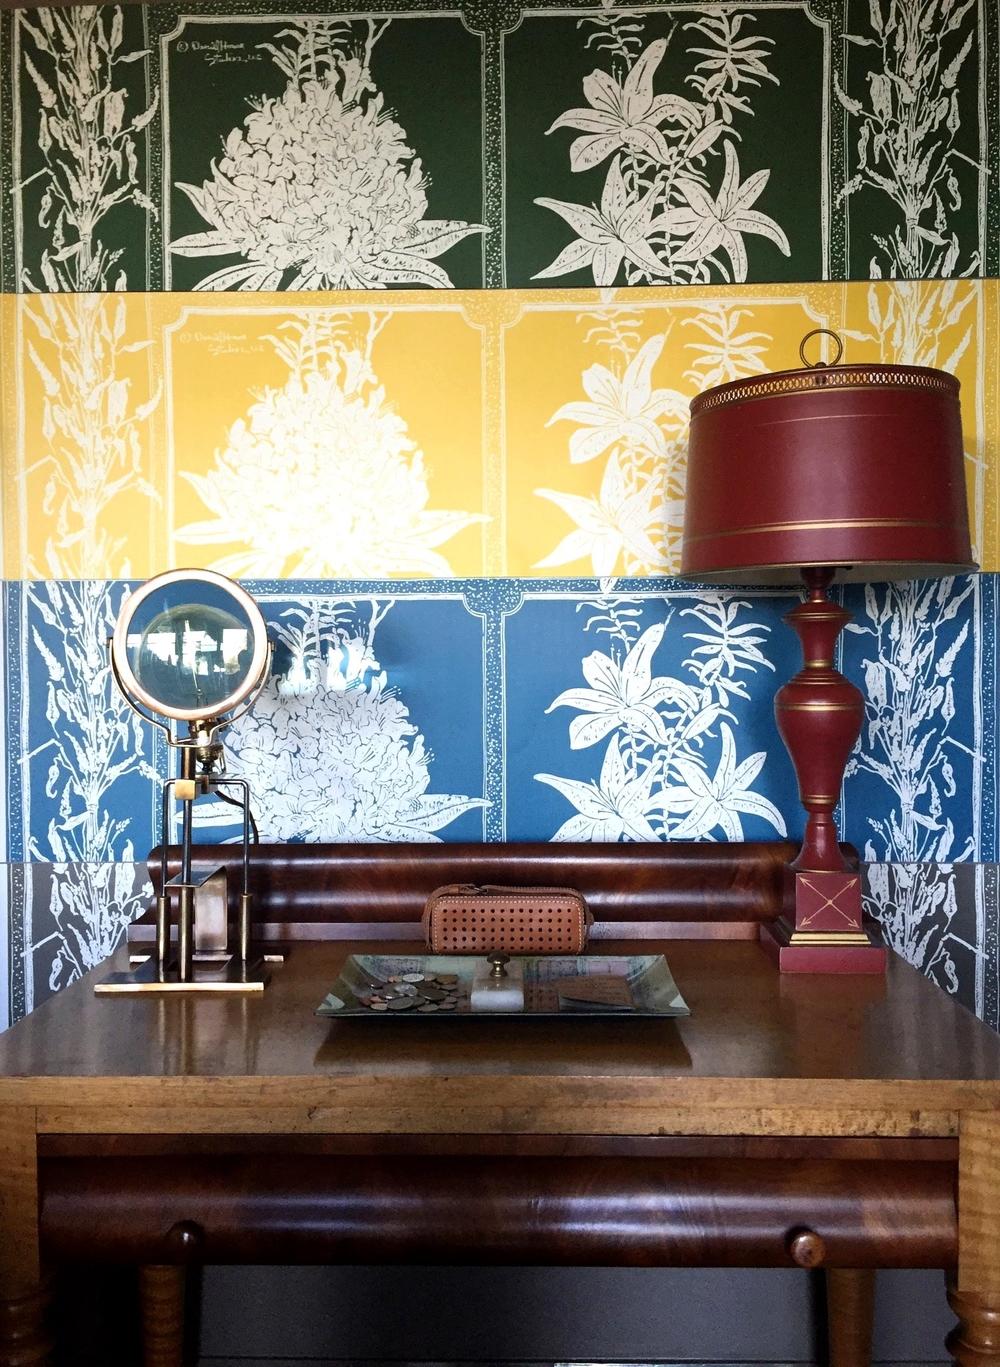 wallpaper-samples-on-wall.jpg